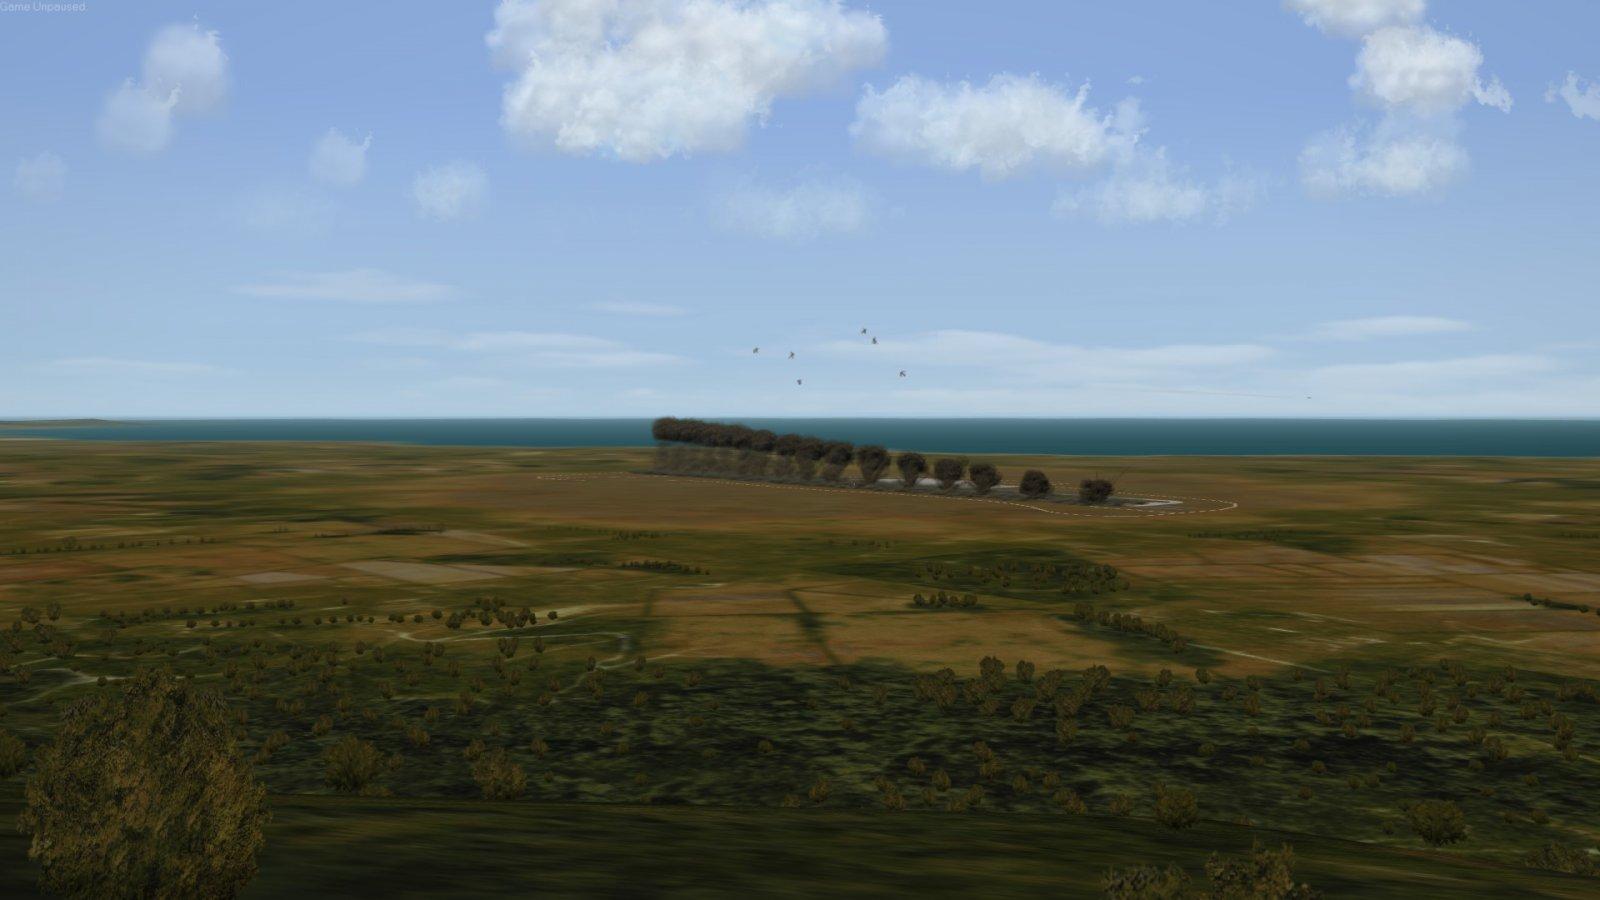 Runway Mk 82 Bomb